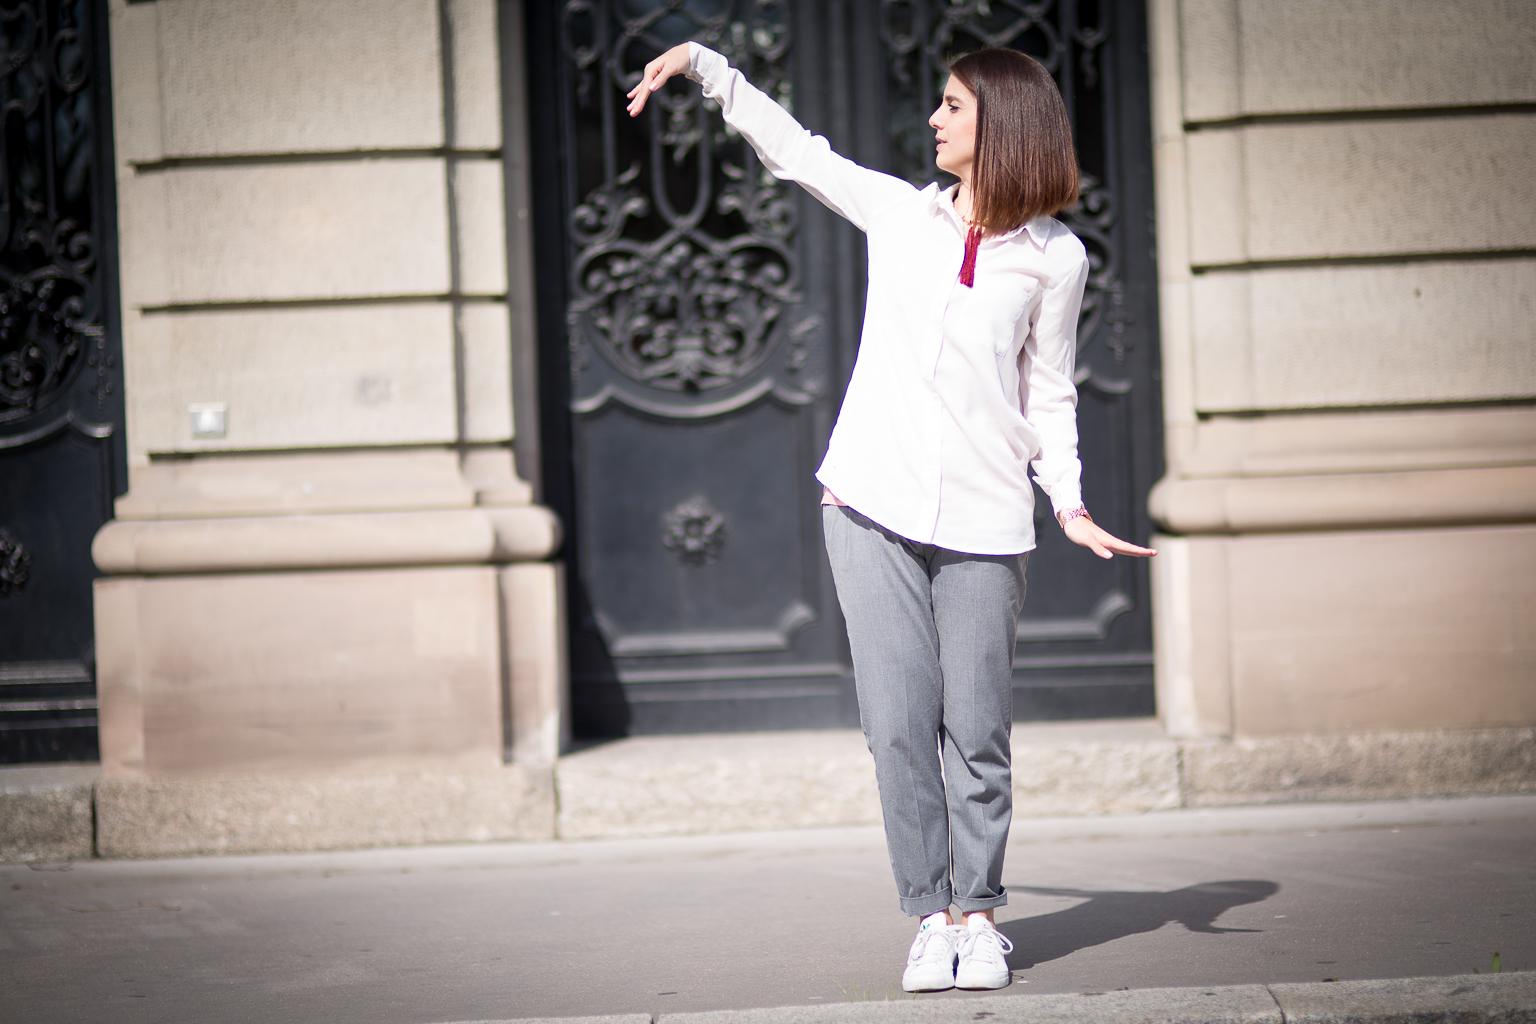 jeune femme brune dansant dans la rue